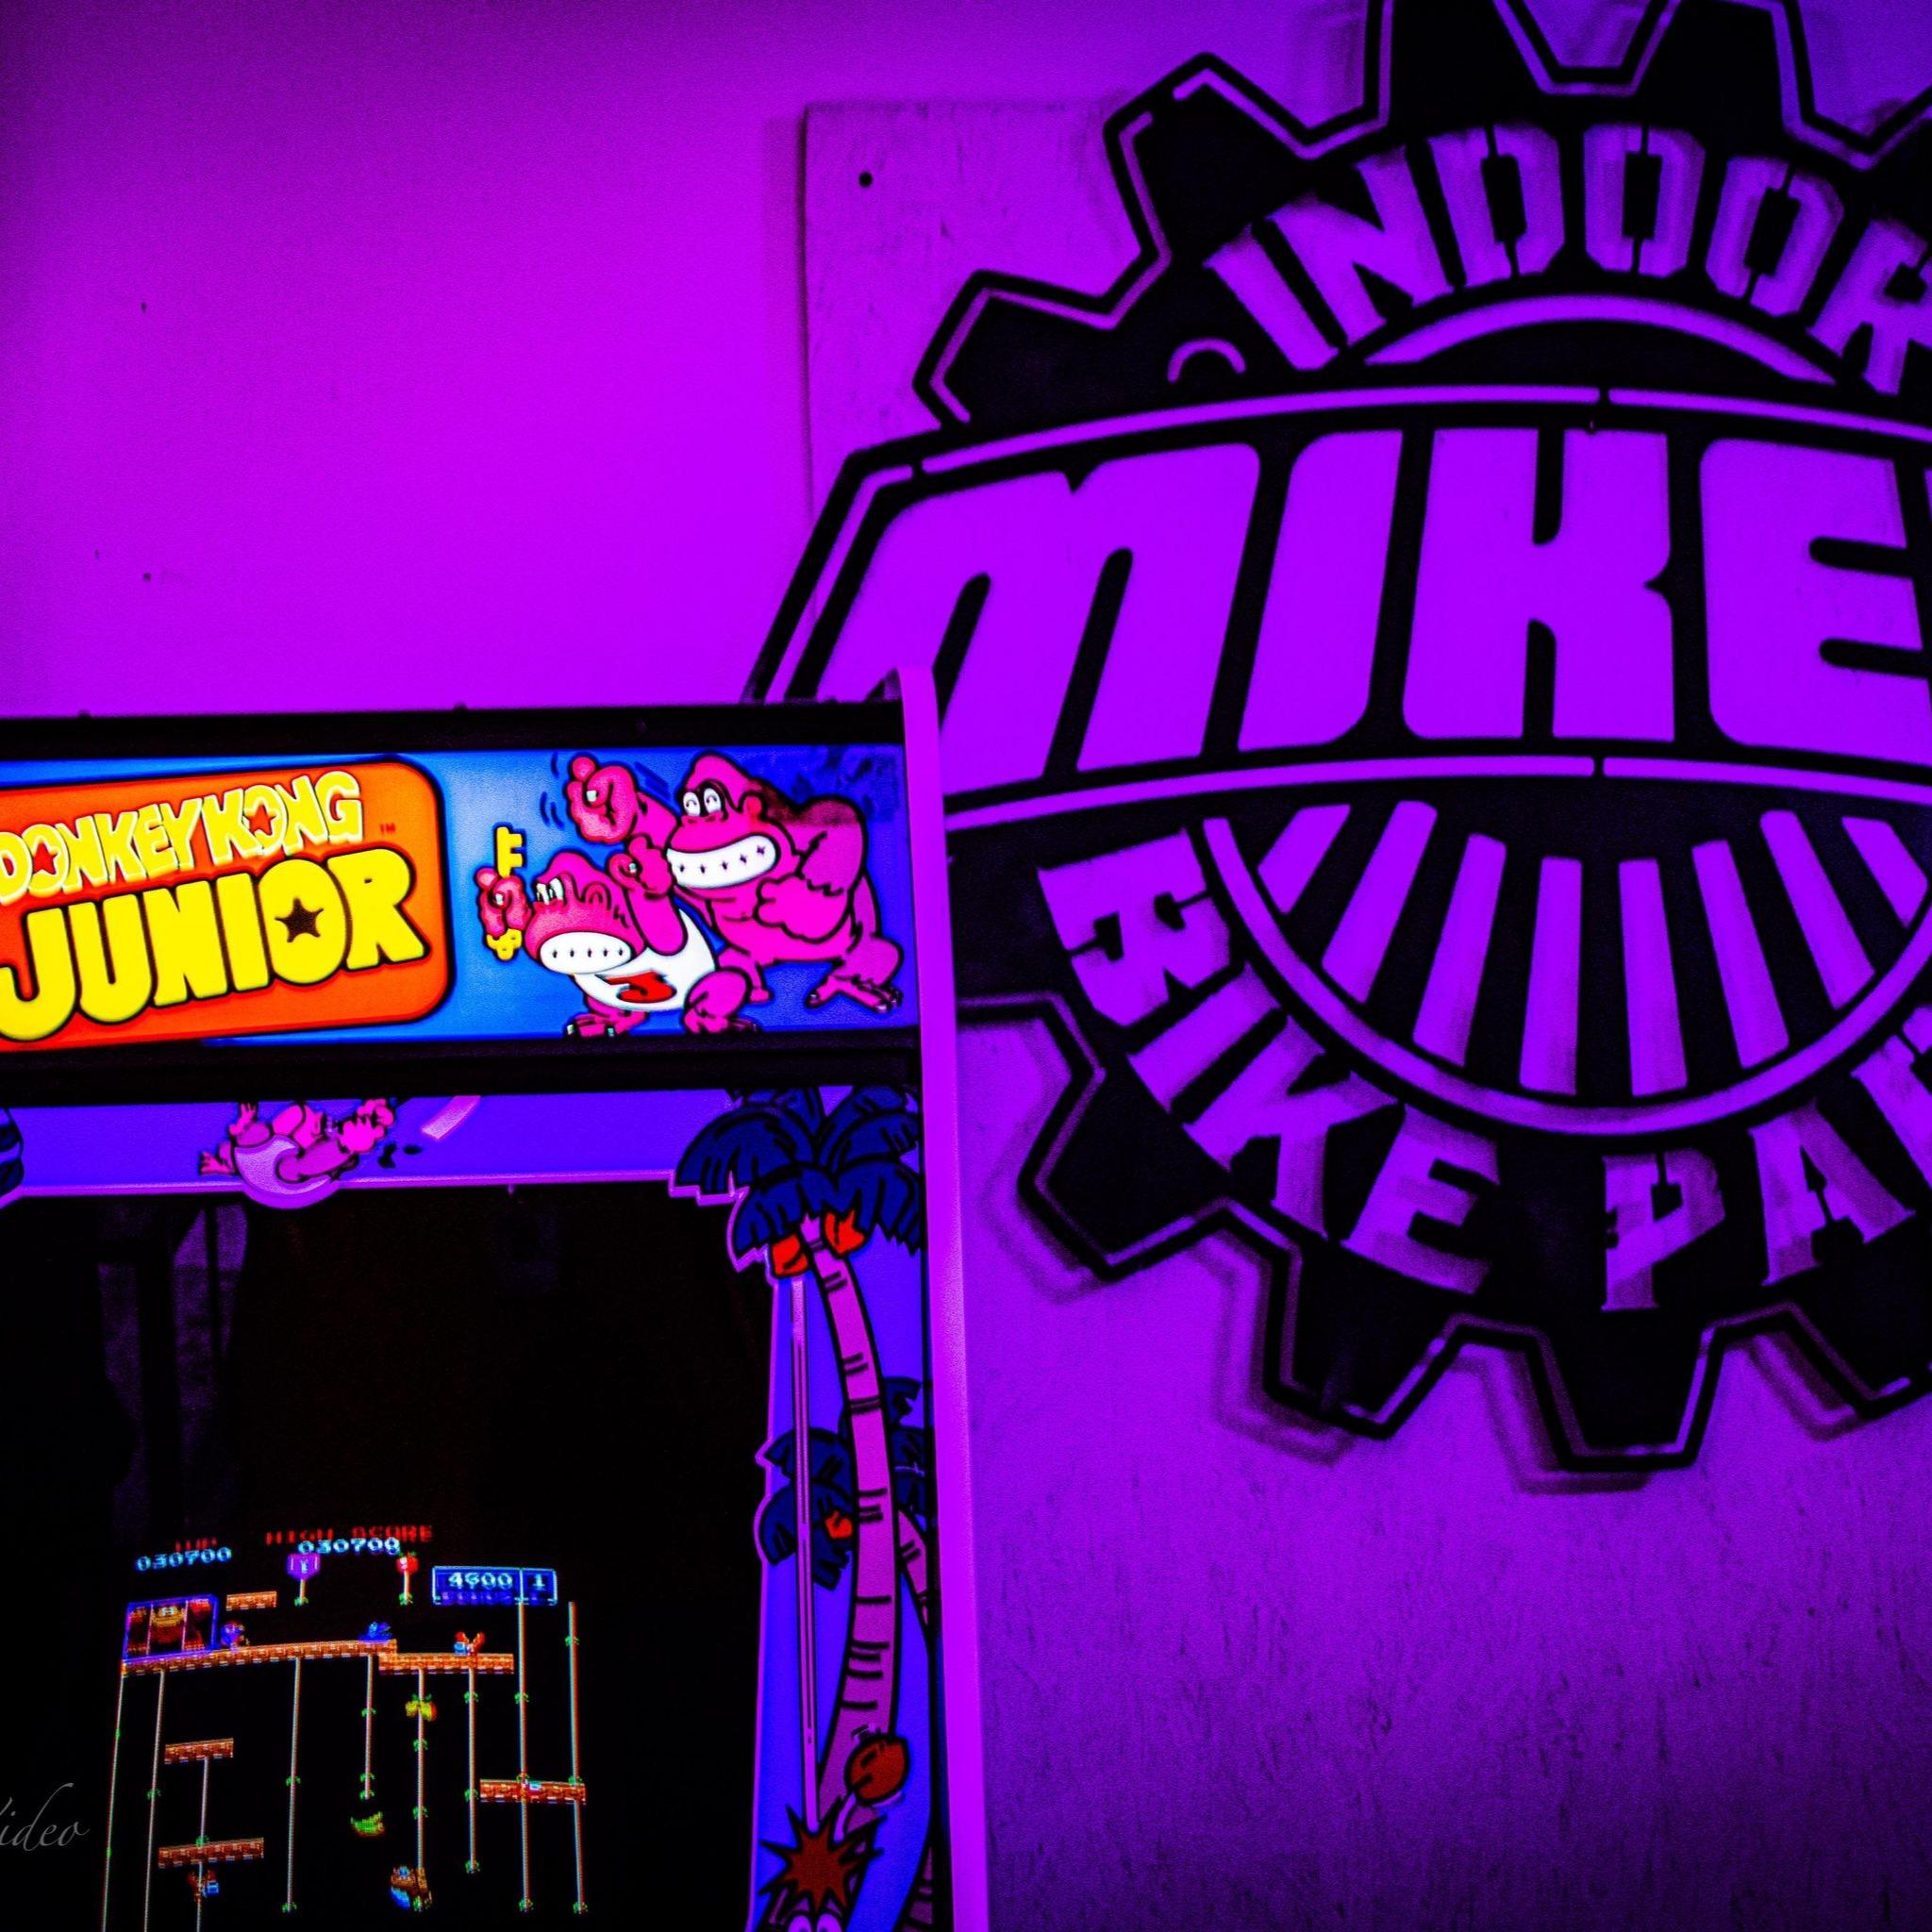 Donkey Kong Jr Game